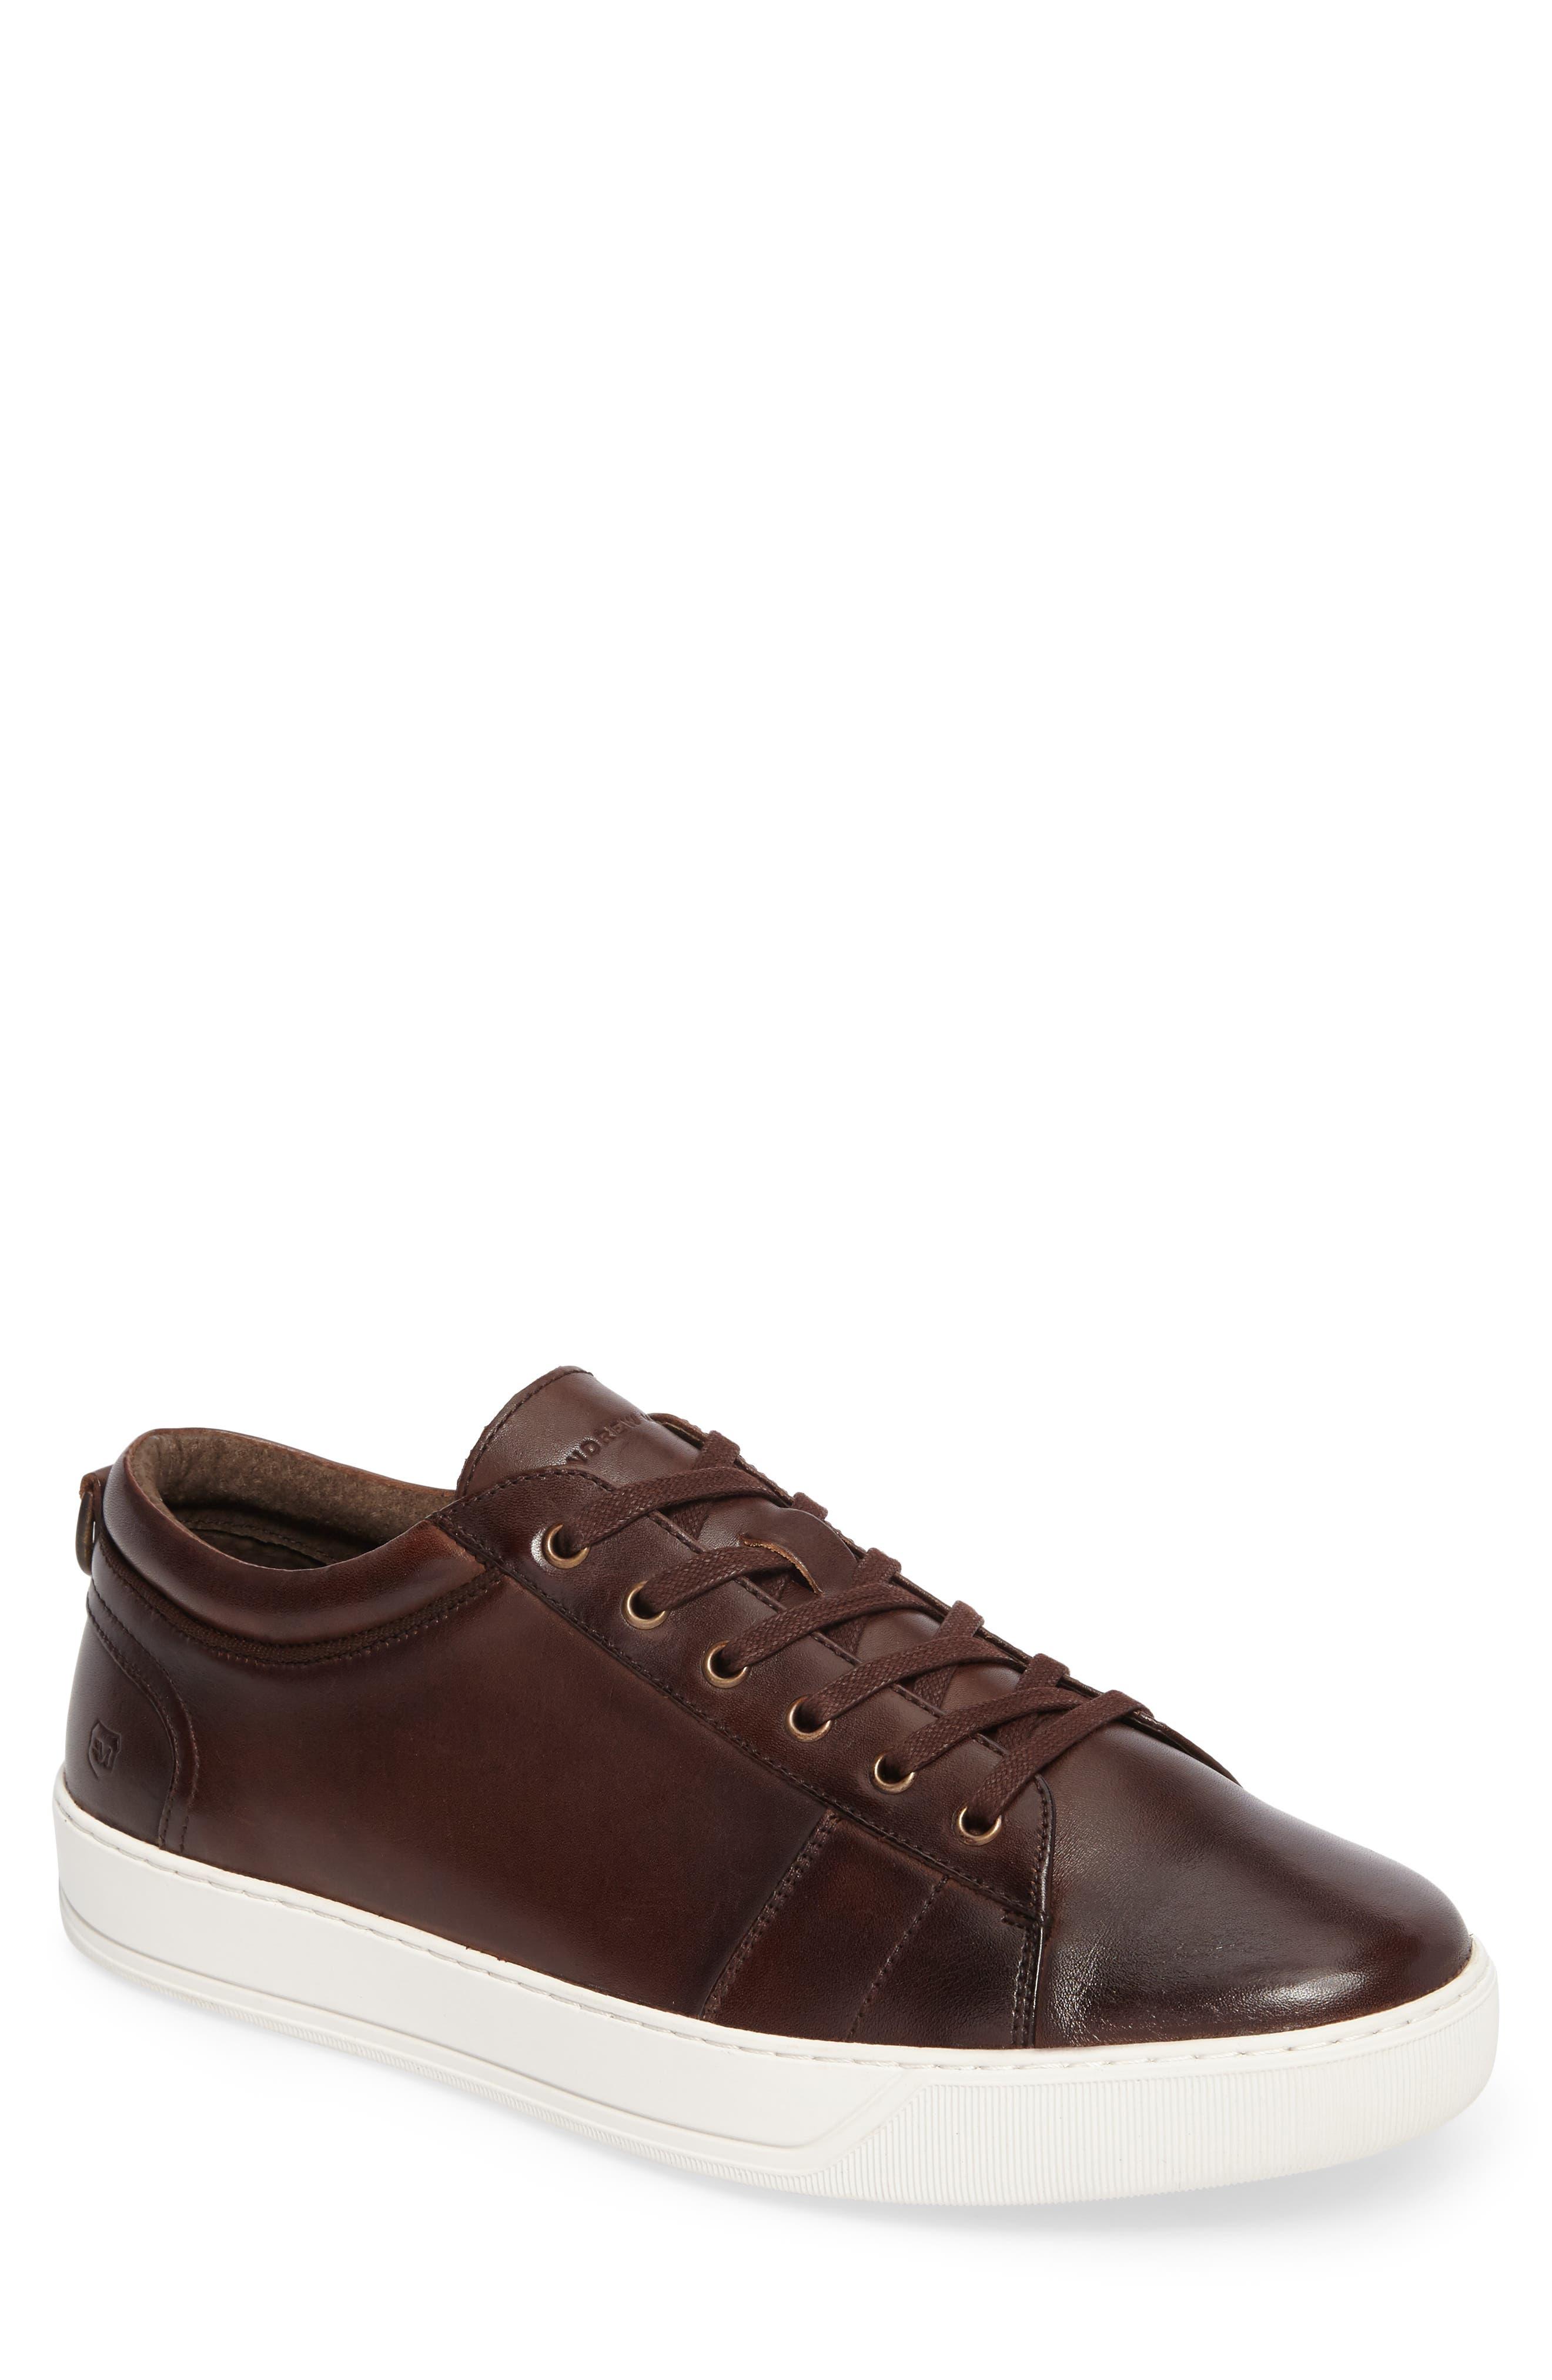 'Darwood' Sneaker,                             Main thumbnail 1, color,                             Dark Brown/ White Leather